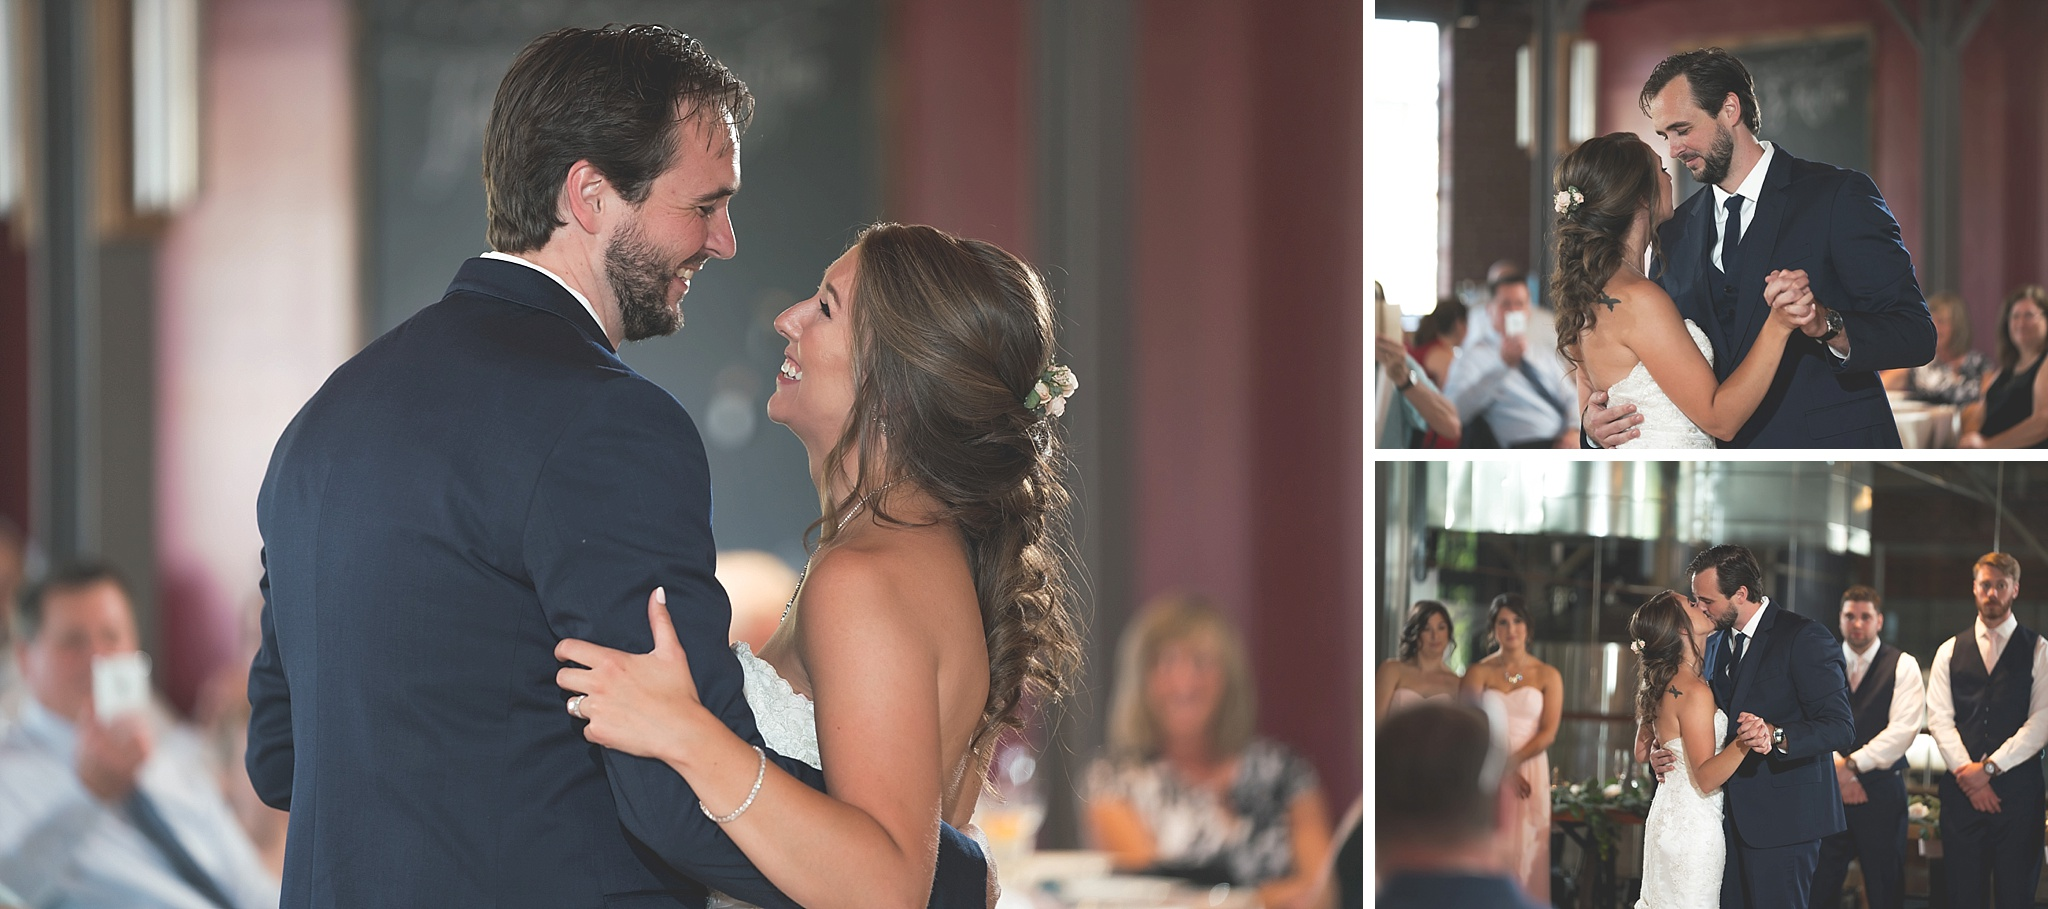 Rickhouse-Durham-NC-Wedding-Photographer-061.jpg